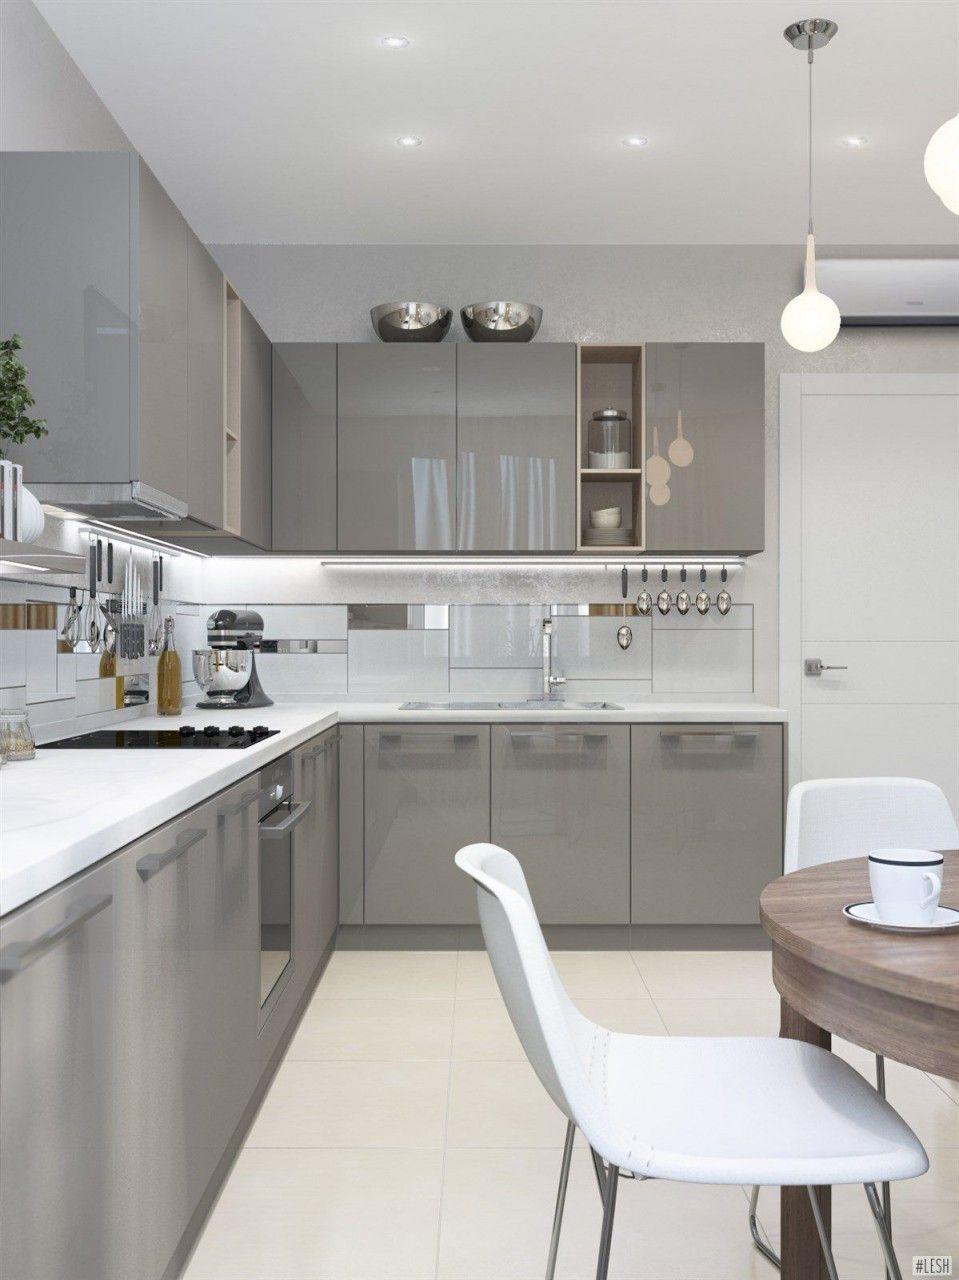 Decoracion Salon Sillon Azul Con Rojo Decoracion De Interiores En Azul El Diseno Muebles De Cocina Colores Para Cocinas Modernas Diseno De Interiores De Cocina